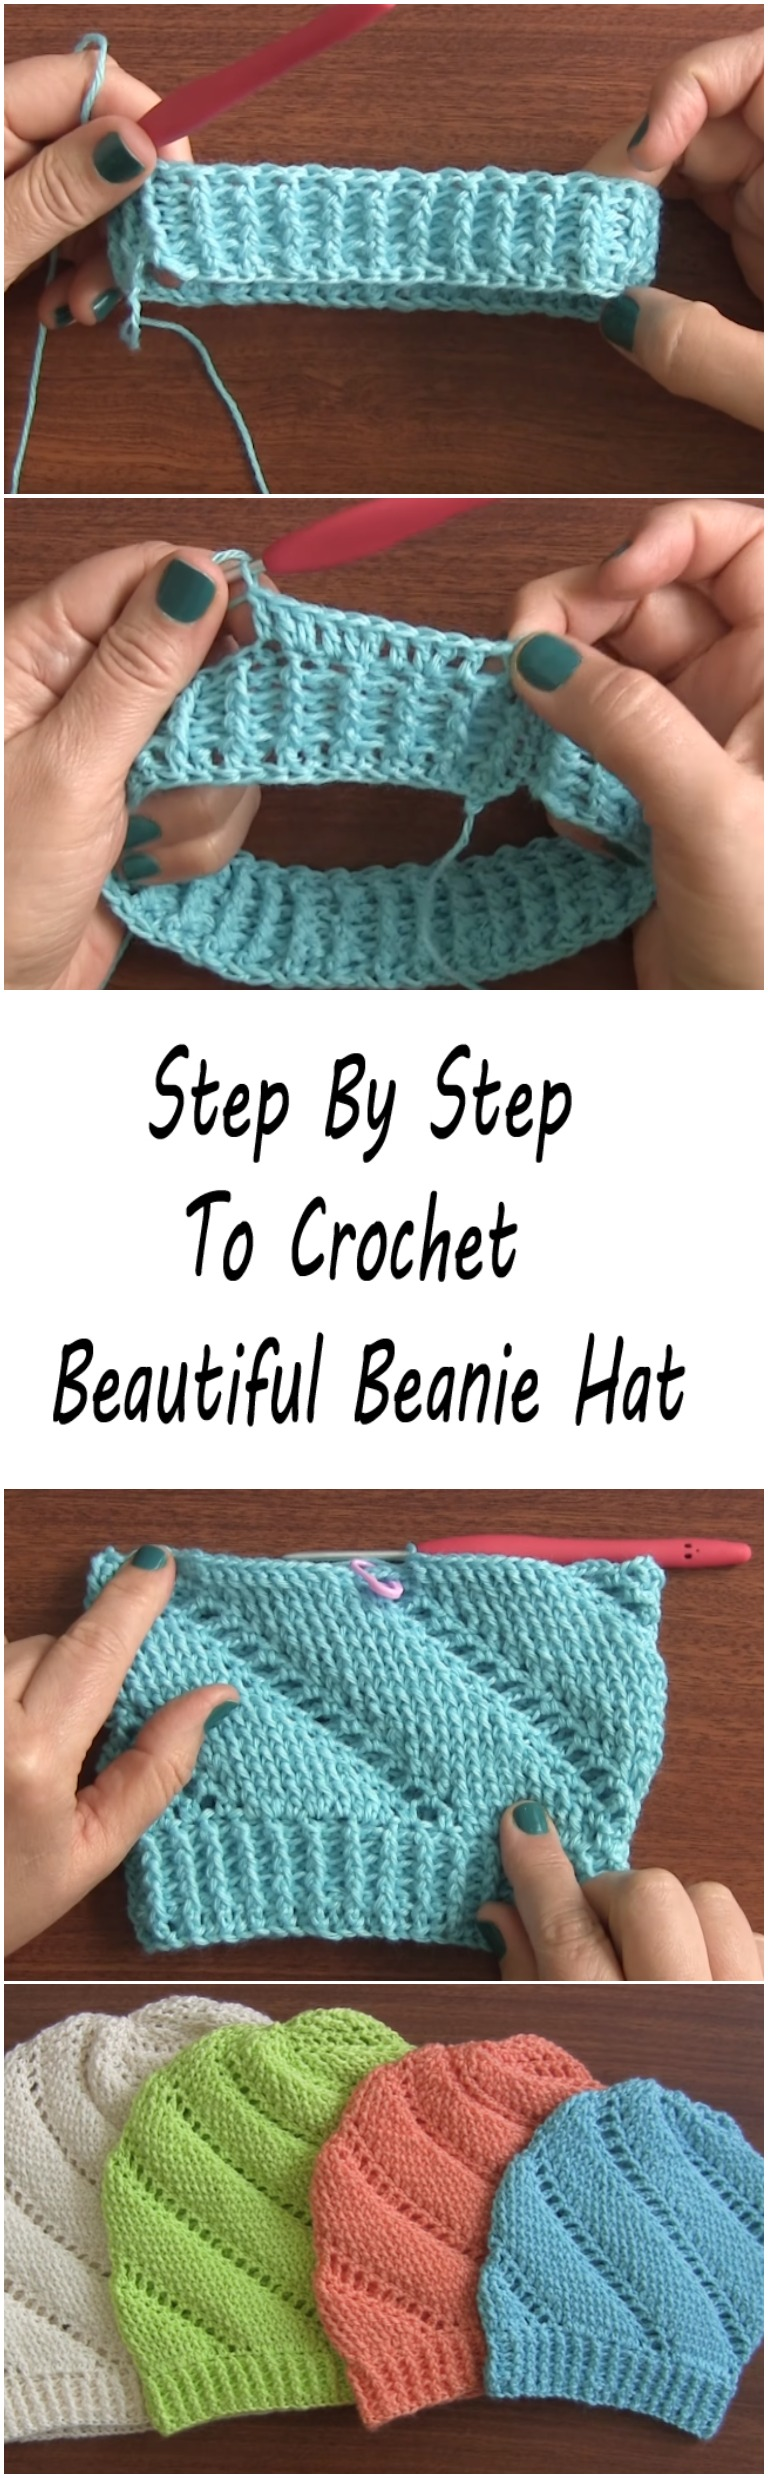 Beautiful Beanie Hat